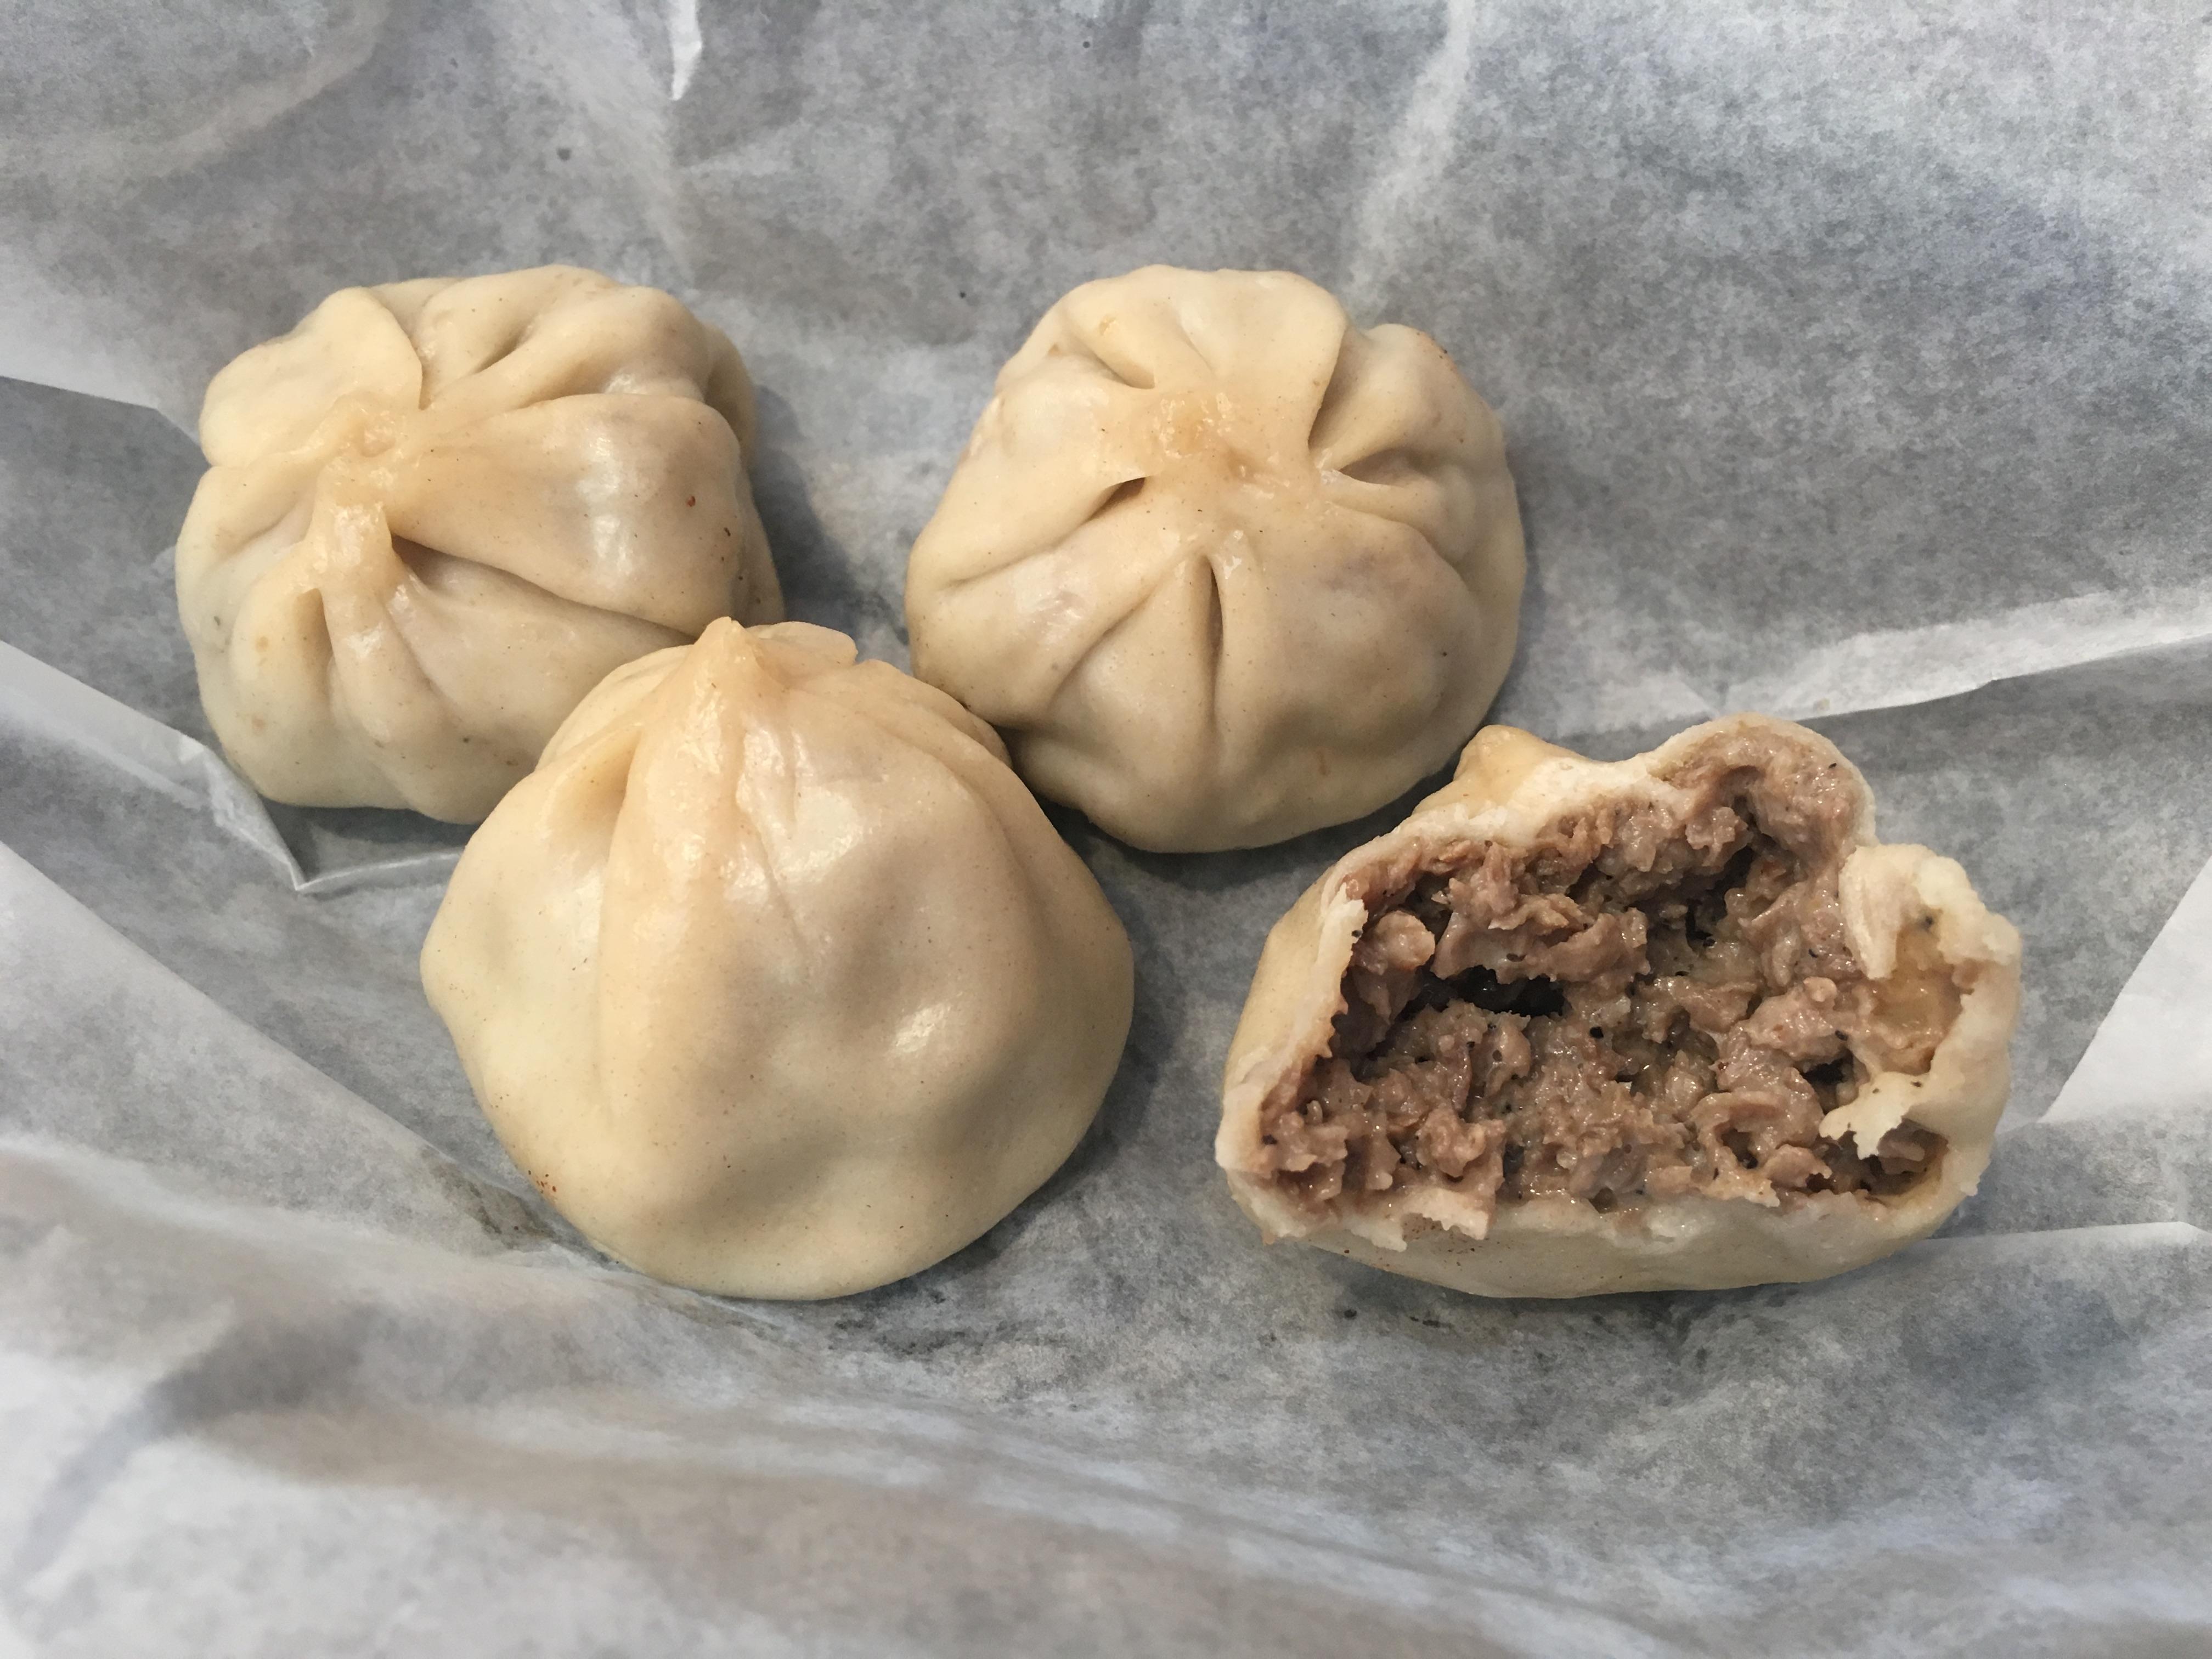 Cheesesteak dumplings (steamed, upon request) from Humpty´s Dumplings, 705 E. Passyunk Ave.